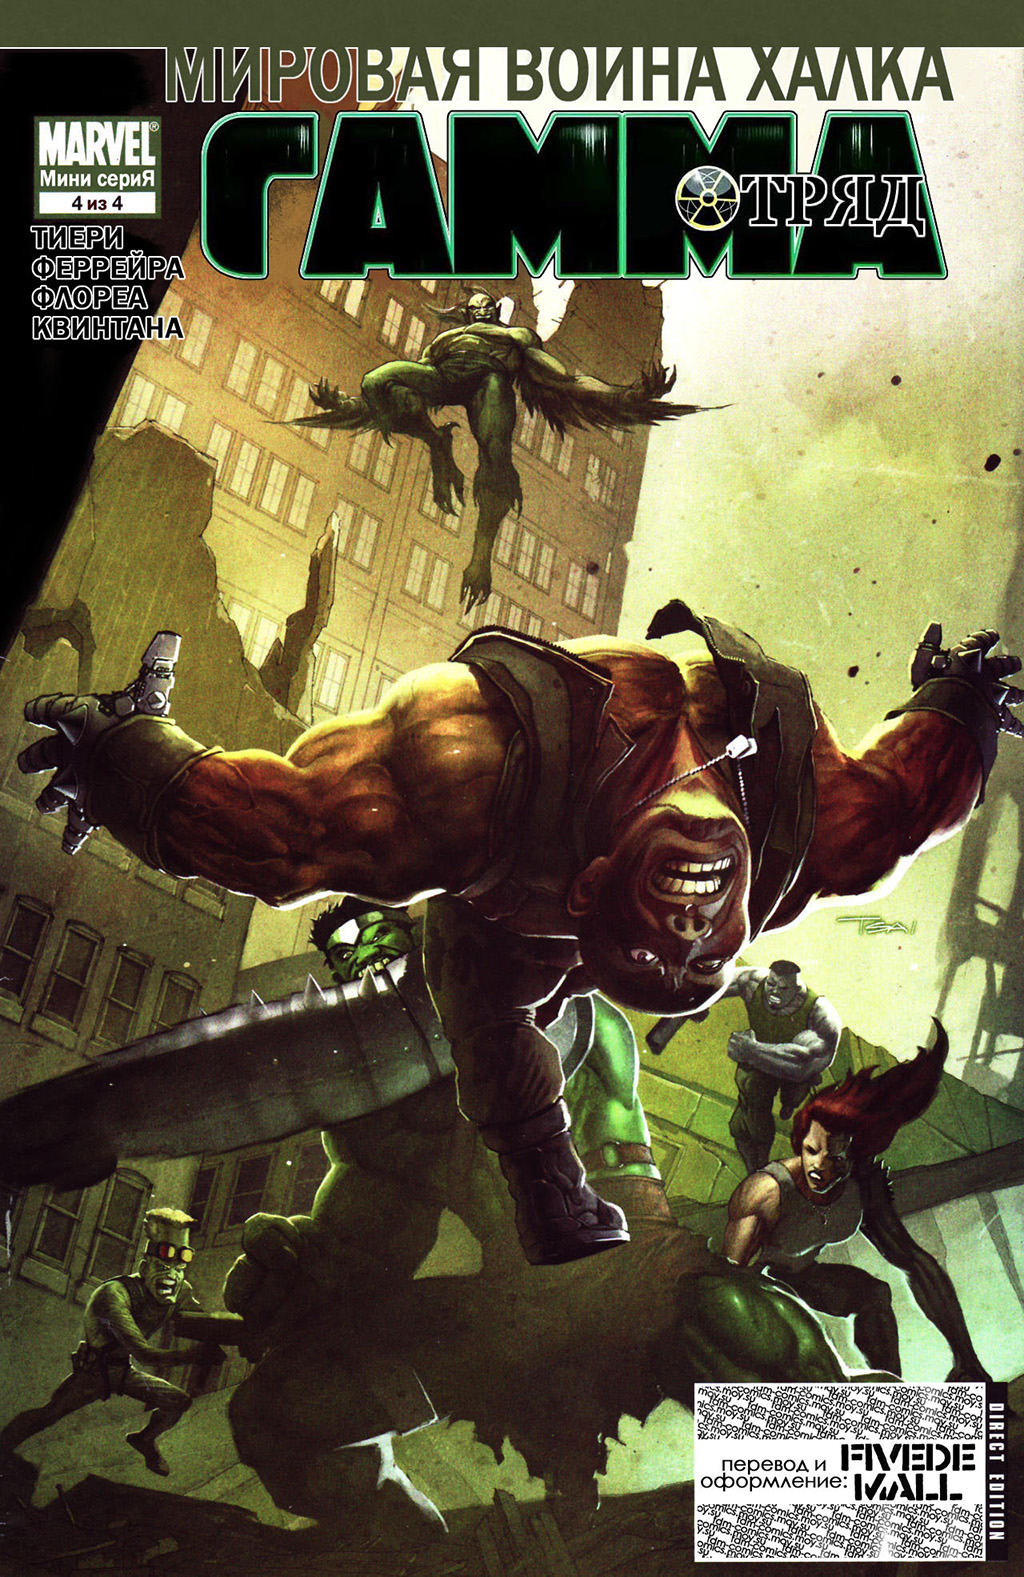 Комикс Мировая Война Халка: Гамма Отряд